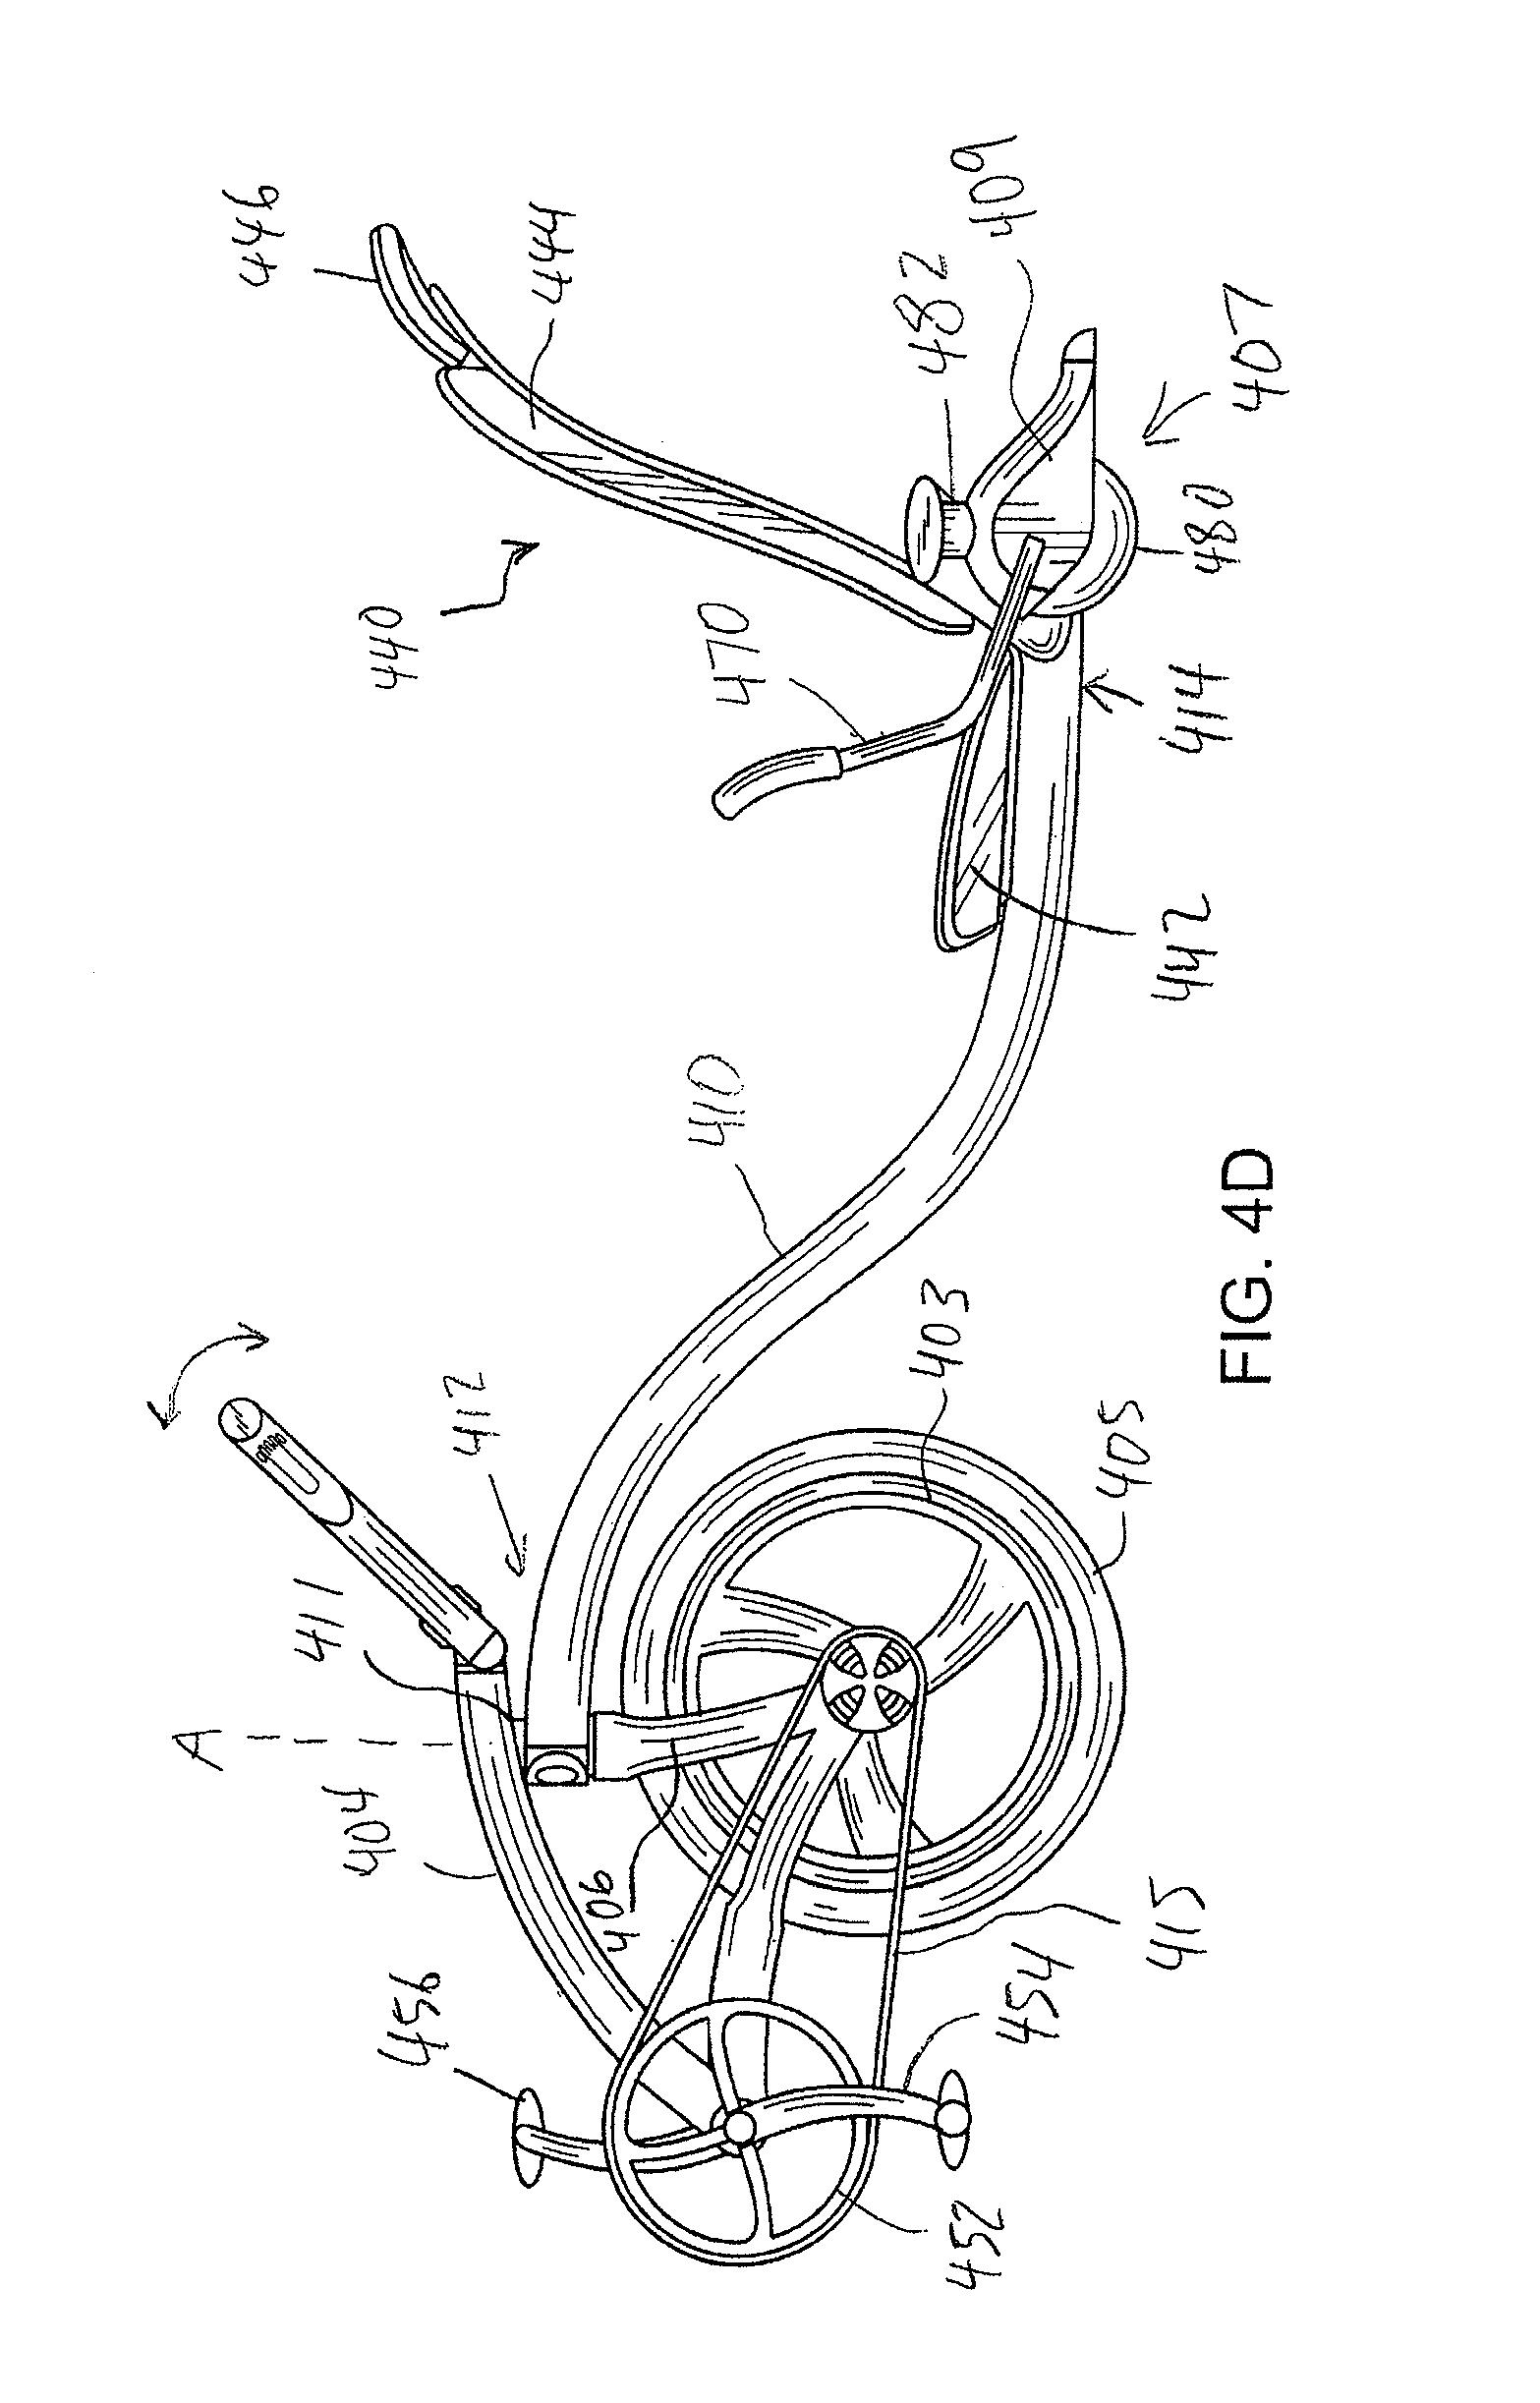 Wiring Diagram For Topline Sunroof